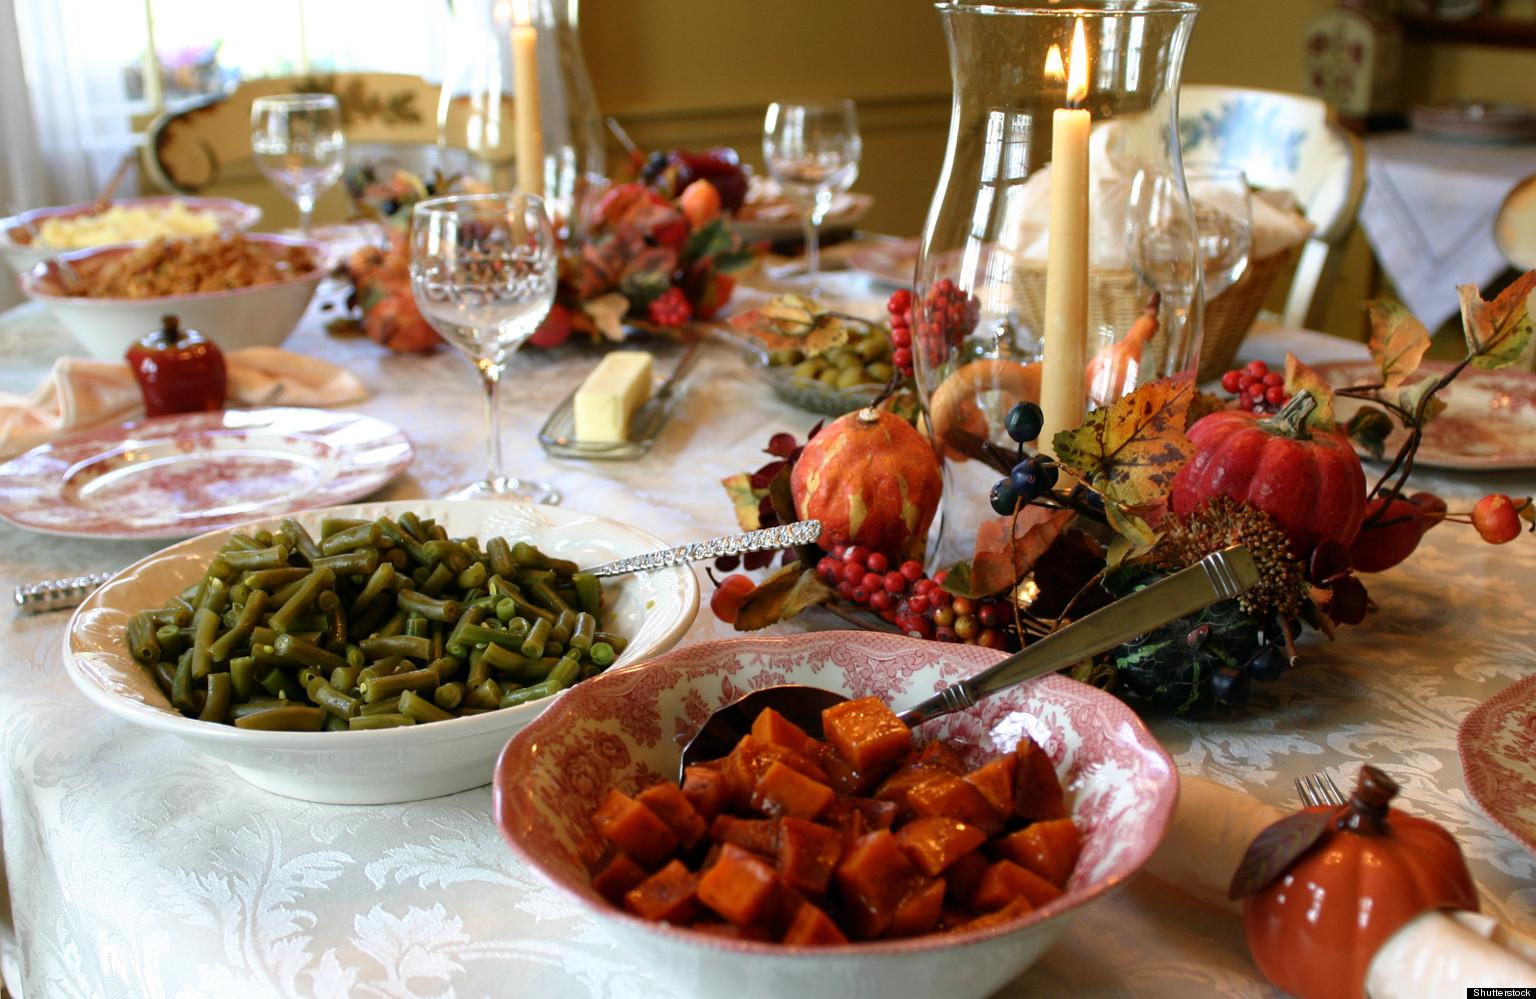 thanksgiving table dinner feast holiday healthy pagan shutterstock enjoy pic foods turkey sides holidays lashae keaira patheos through simple friendly